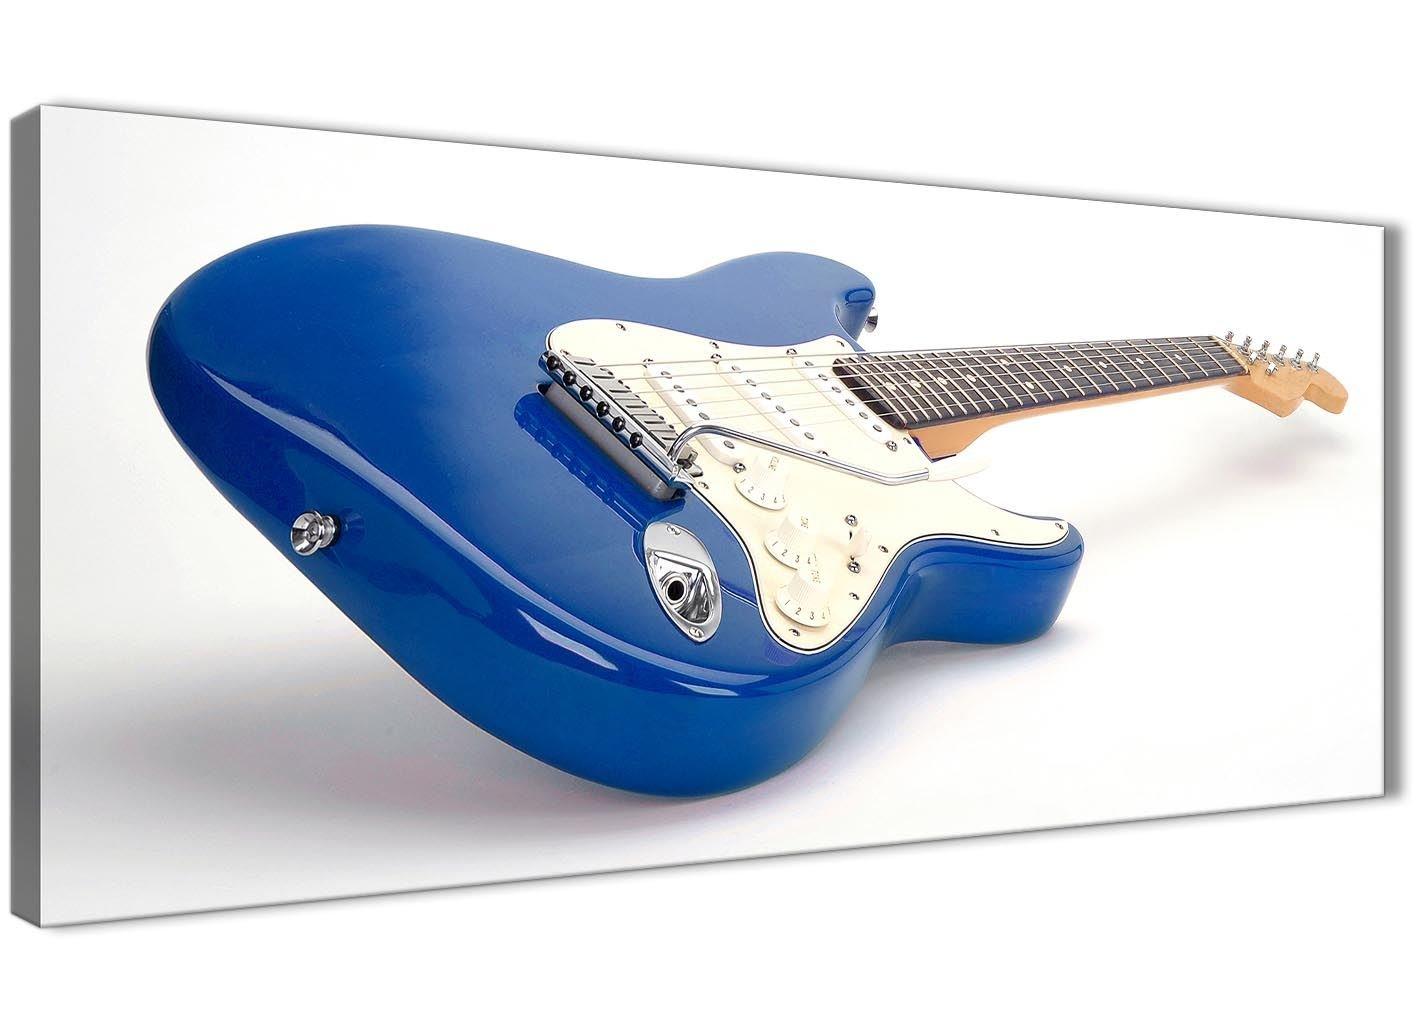 Azul Blanco Fender guitarra eléctrica - sala de estar lienzo pared arte accesorios - 1447 - 120 cm impresión Wallfillers: Amazon.es: Hogar